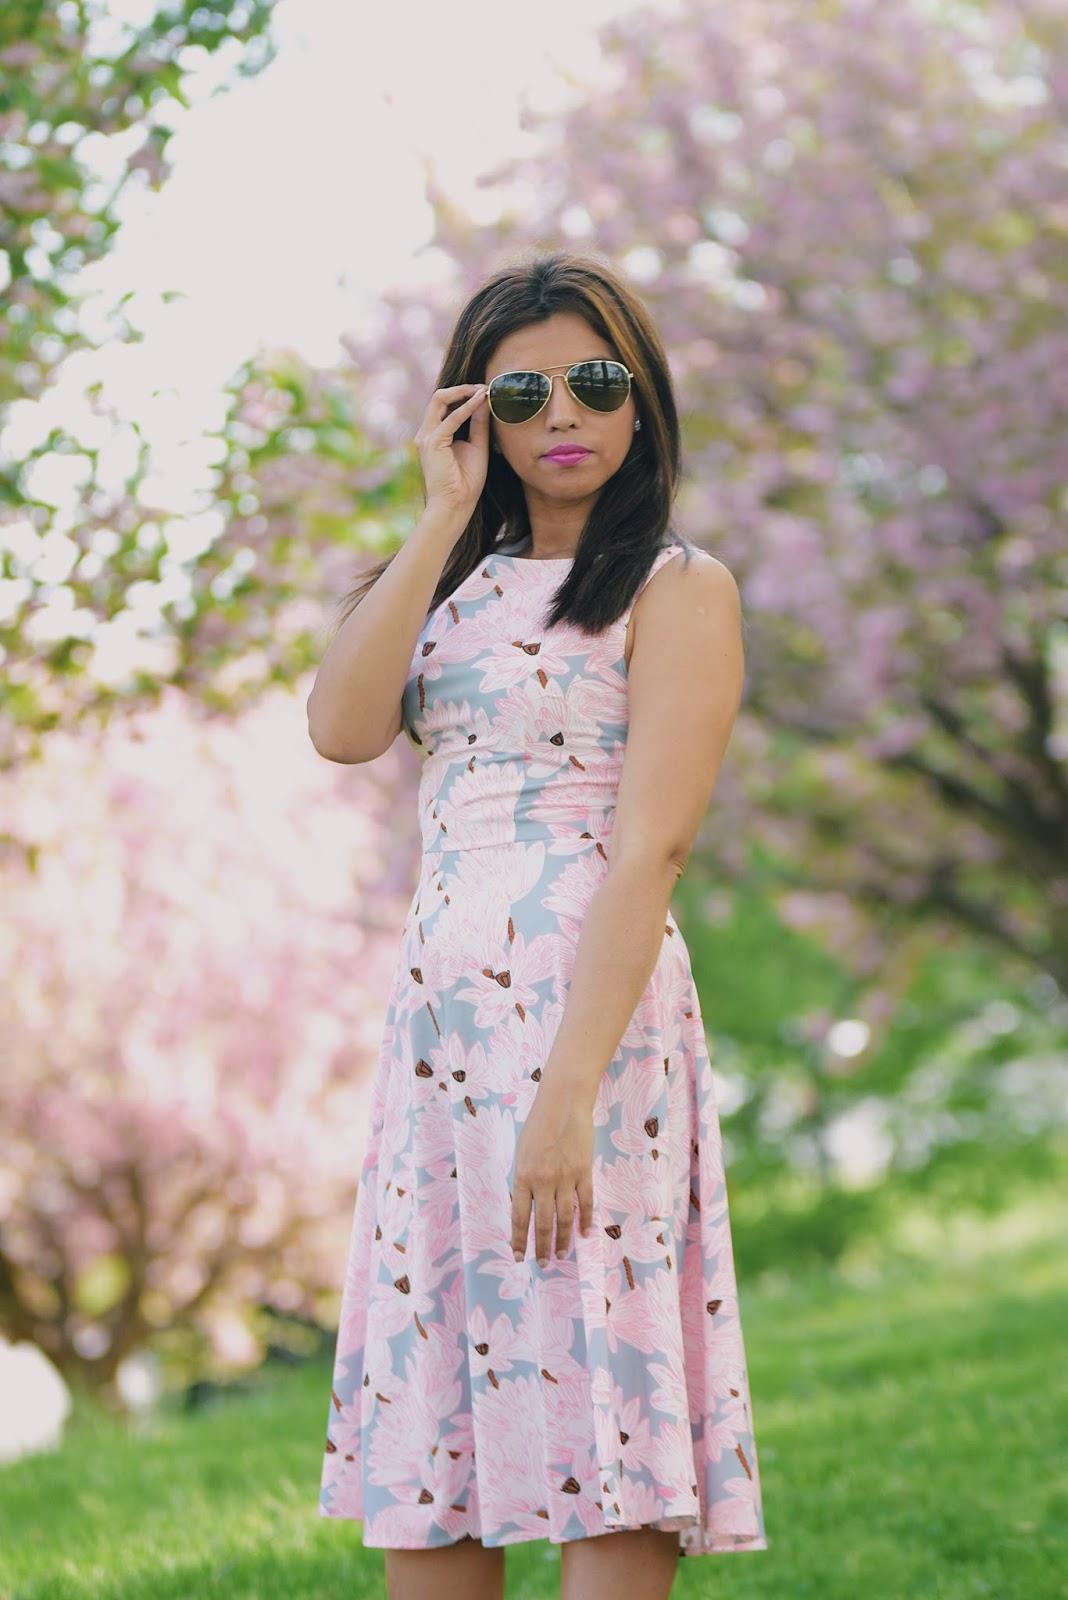 Cherry Blossom Dress-mariestilo-lightinthebox-fashionblogger-lookoftheday-primavera-spring style-armandhugon-celebrando la primavera